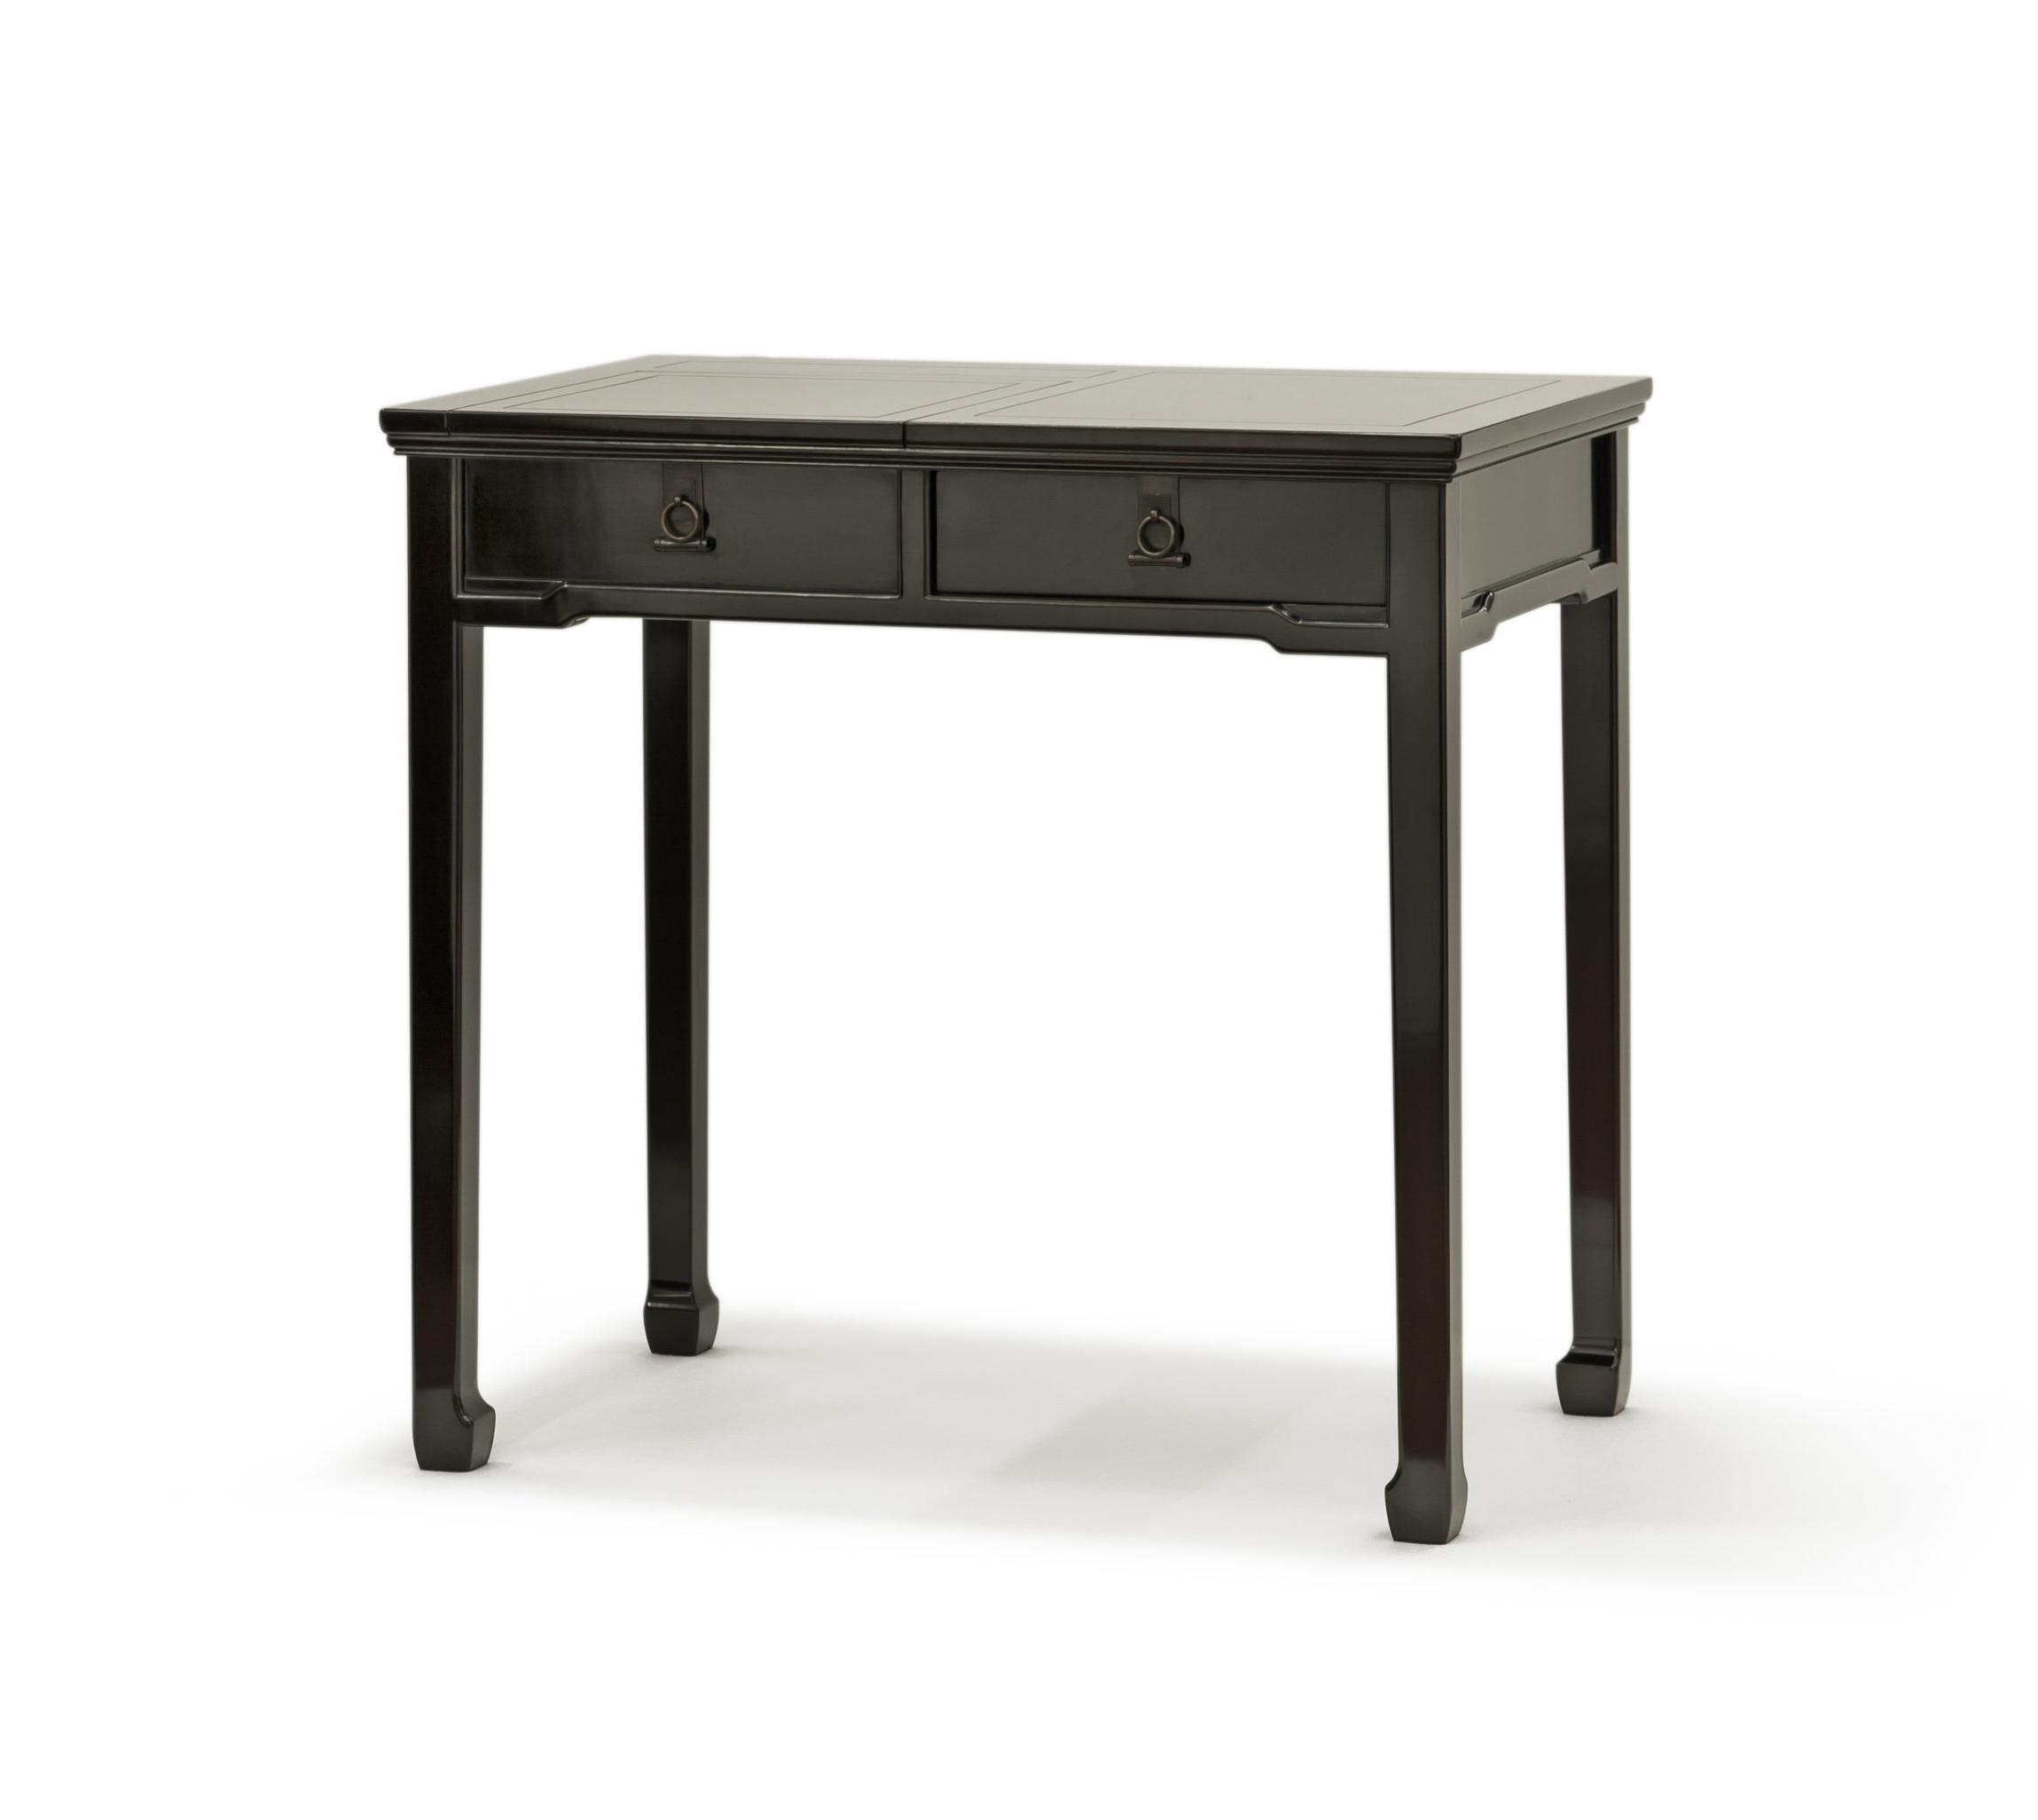 ....chinese ming style furniture | park hyatt washington : dressing table..中式明式家具 | 华盛顿柏悦酒店 :梳妆台....